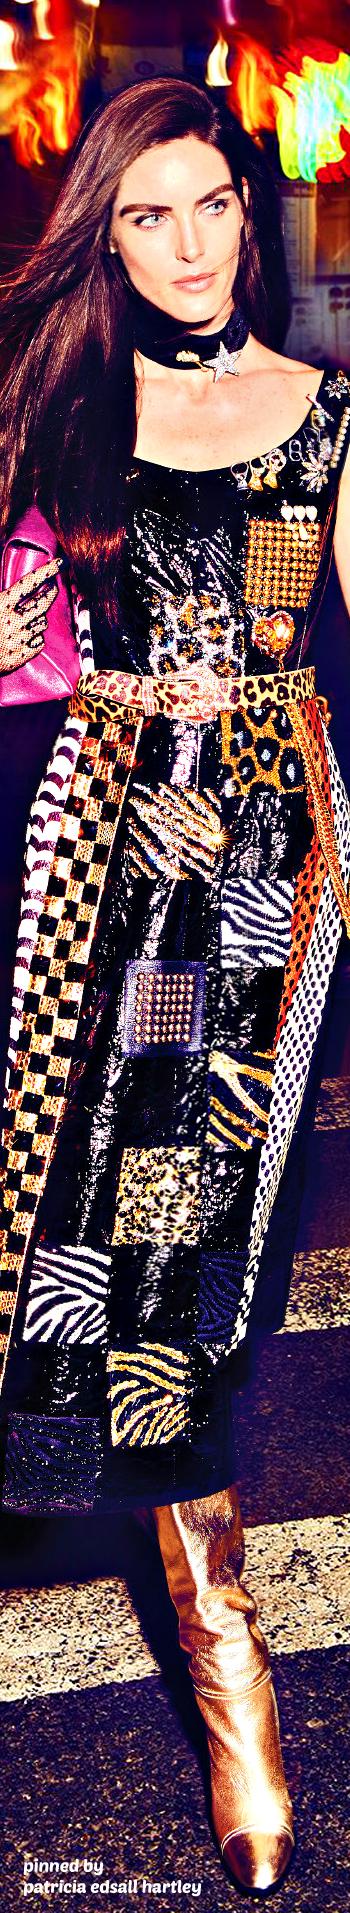 HILARY RHODA - COSMOPOLITAN US DECEMBER 2016